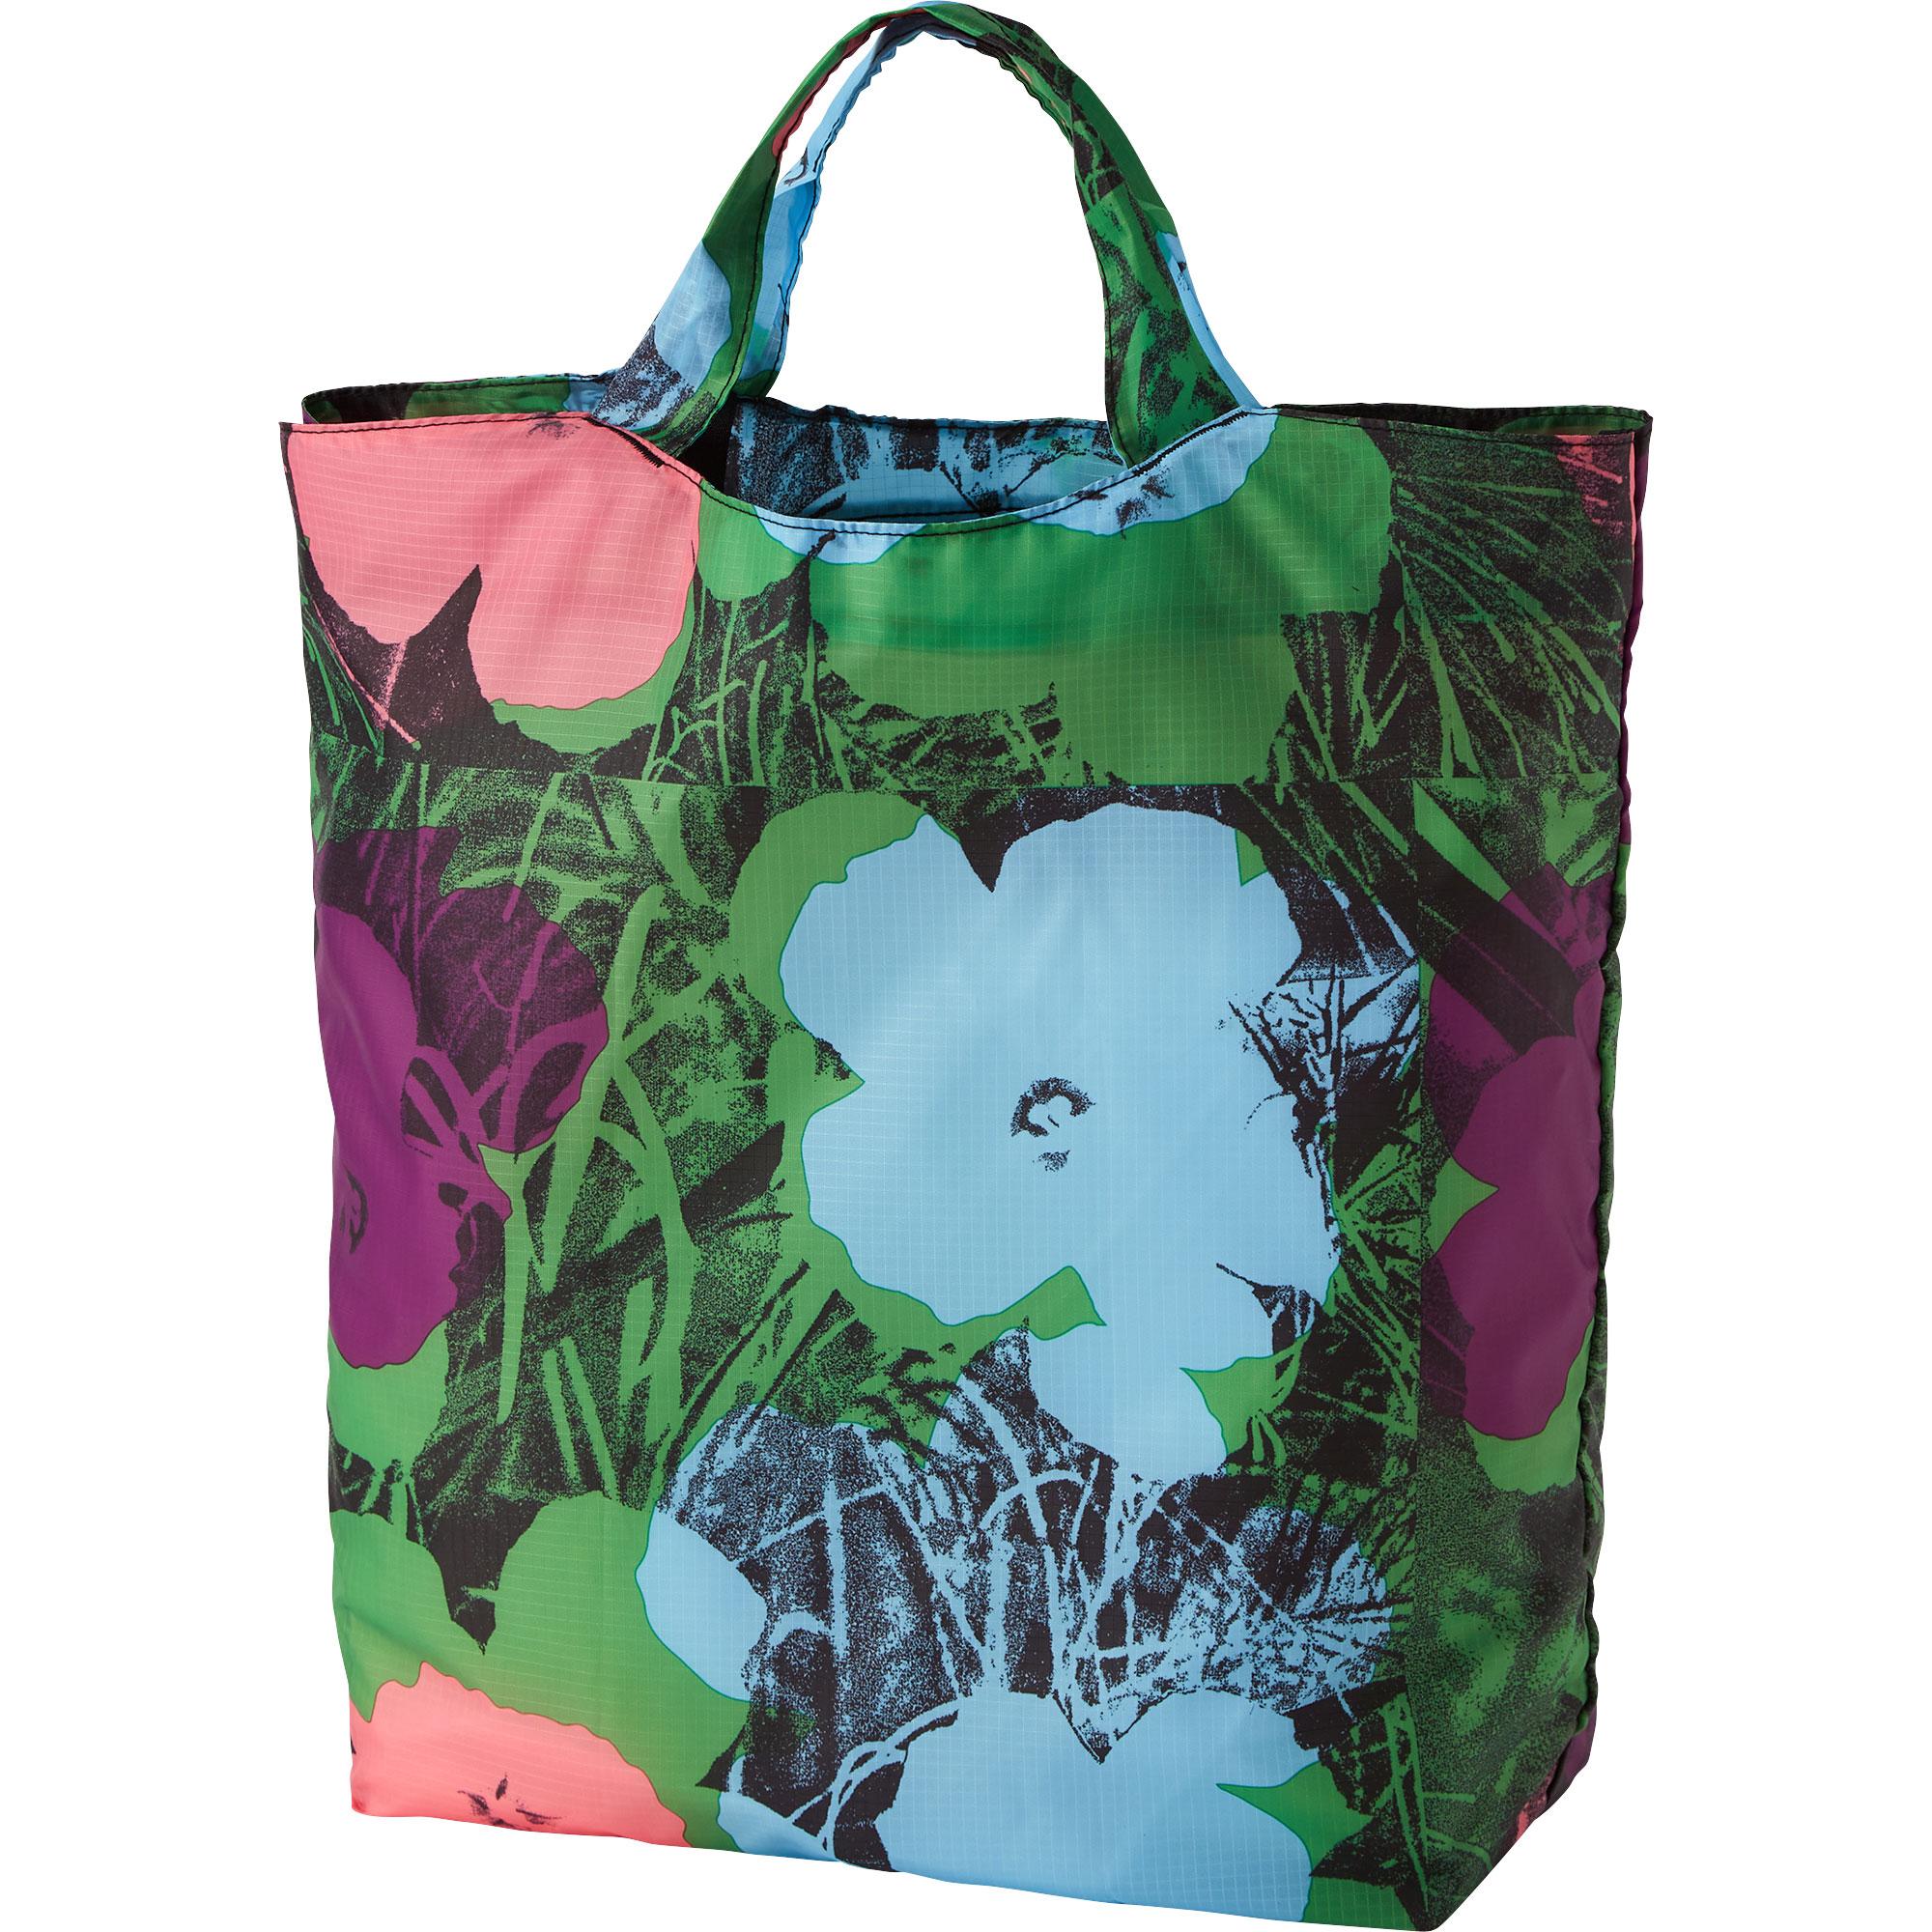 Andy Warhol Pocketable Tote Bag